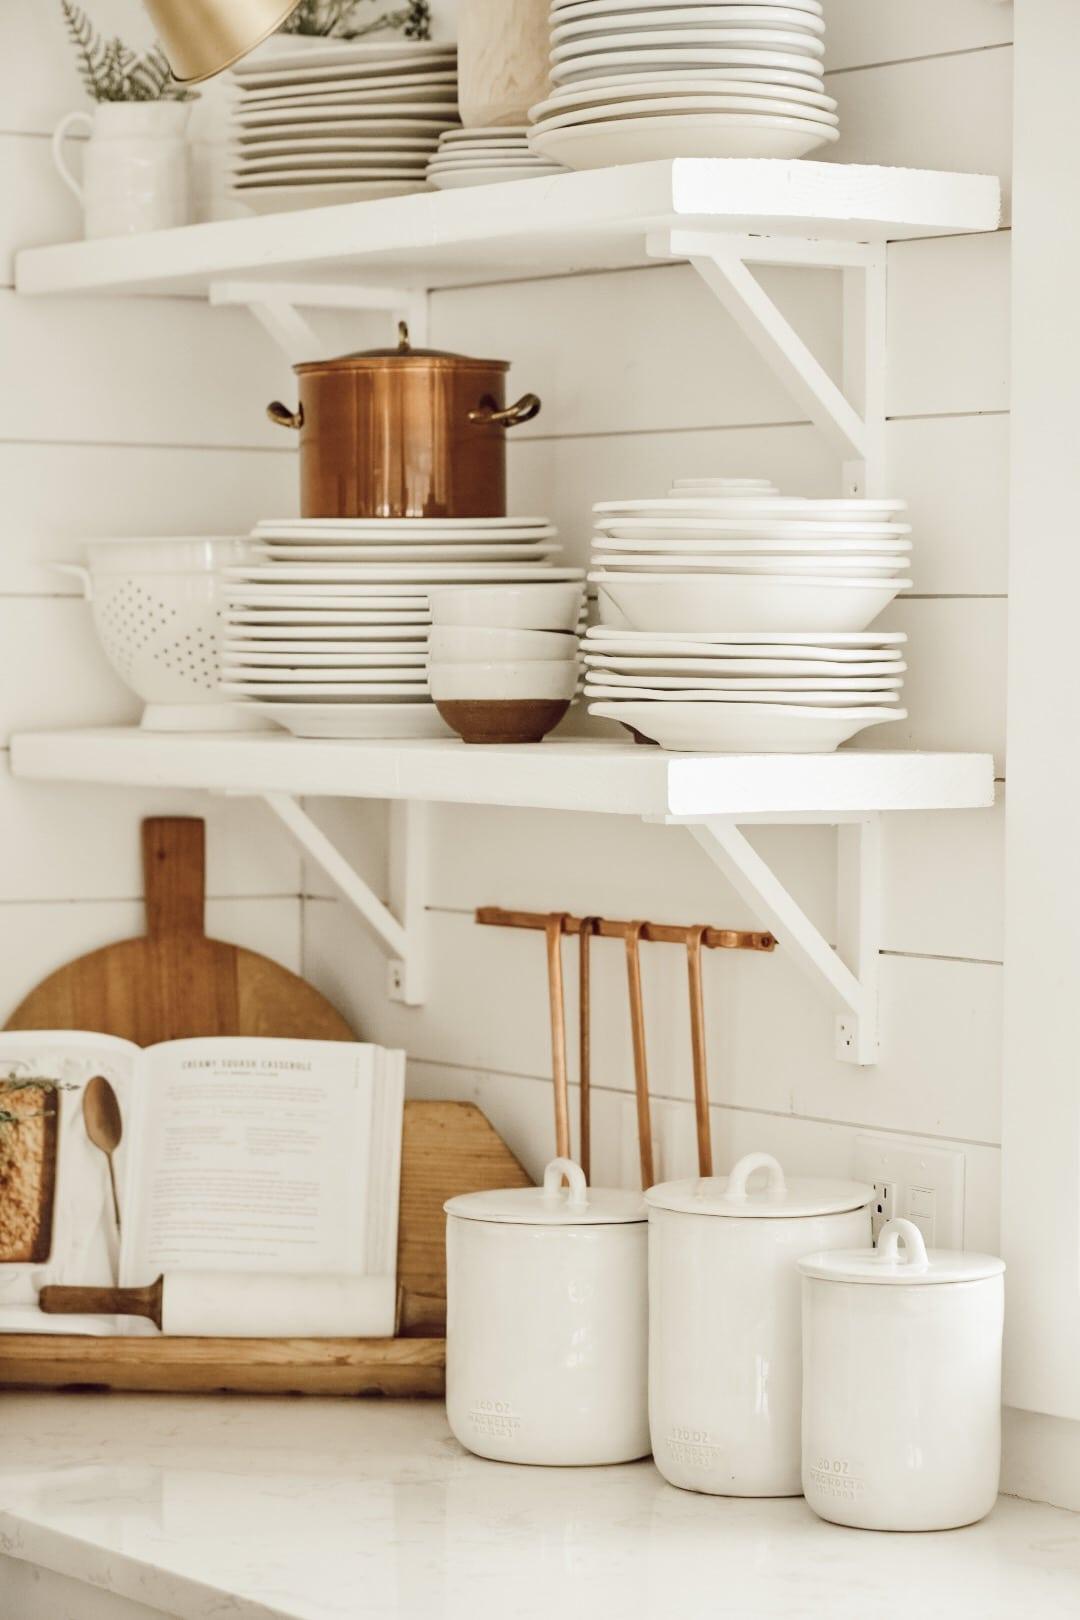 Plates on open kitchen shelves